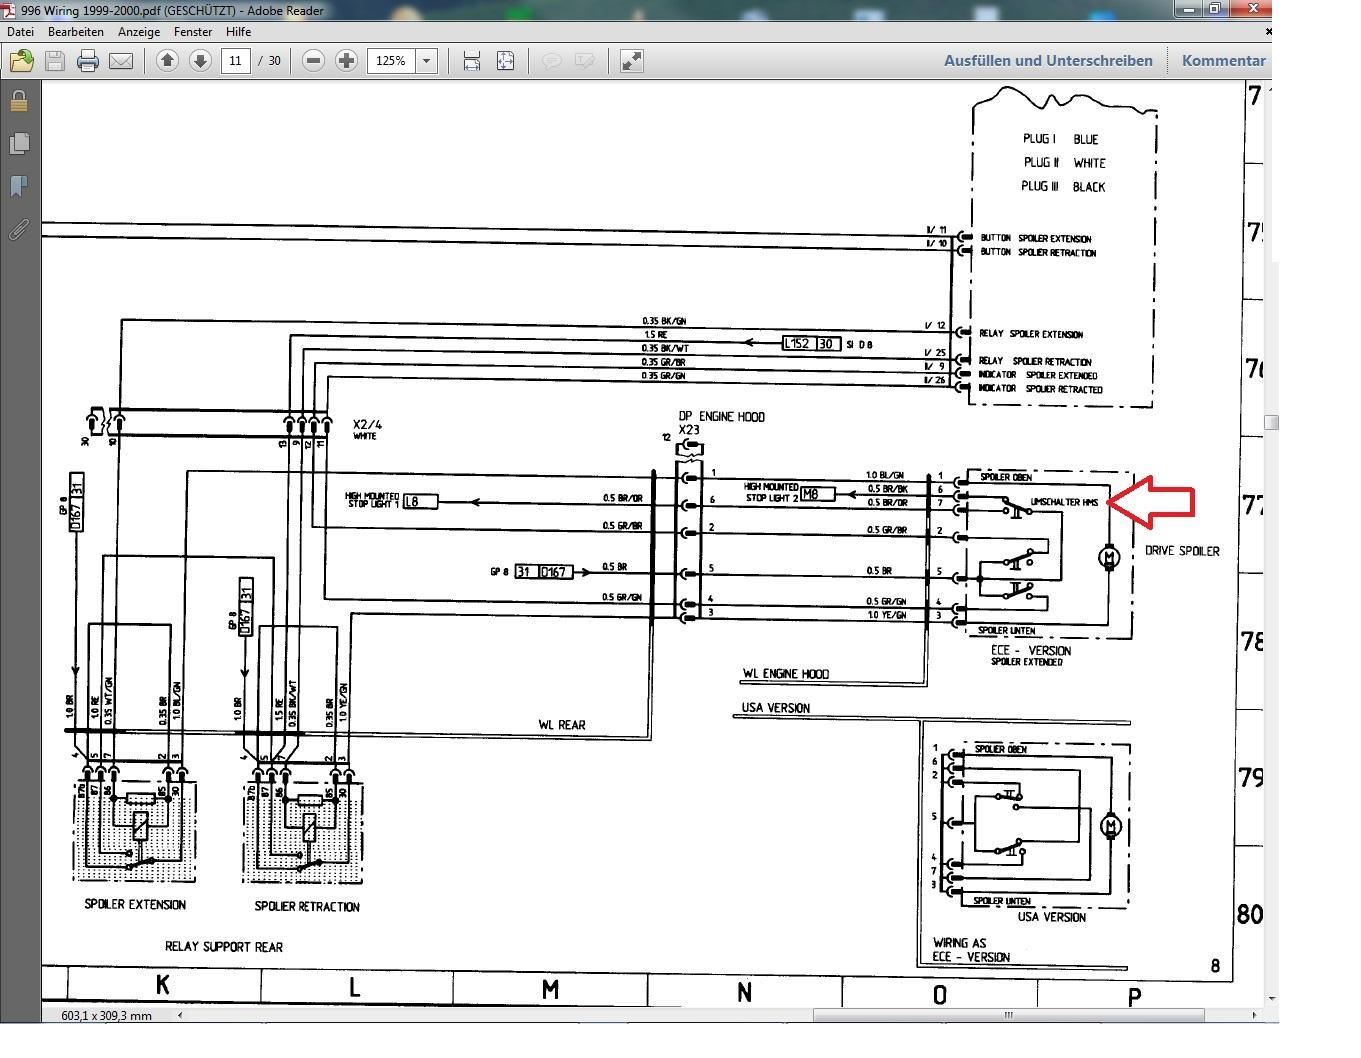 999908d1449821961 fixed spoiler 99661207051 wiring diagram 996?resized665%2C5176ssld1 porsche 996 wiring diagram efcaviation com GM LS Wiring Diagram at suagrazia.org